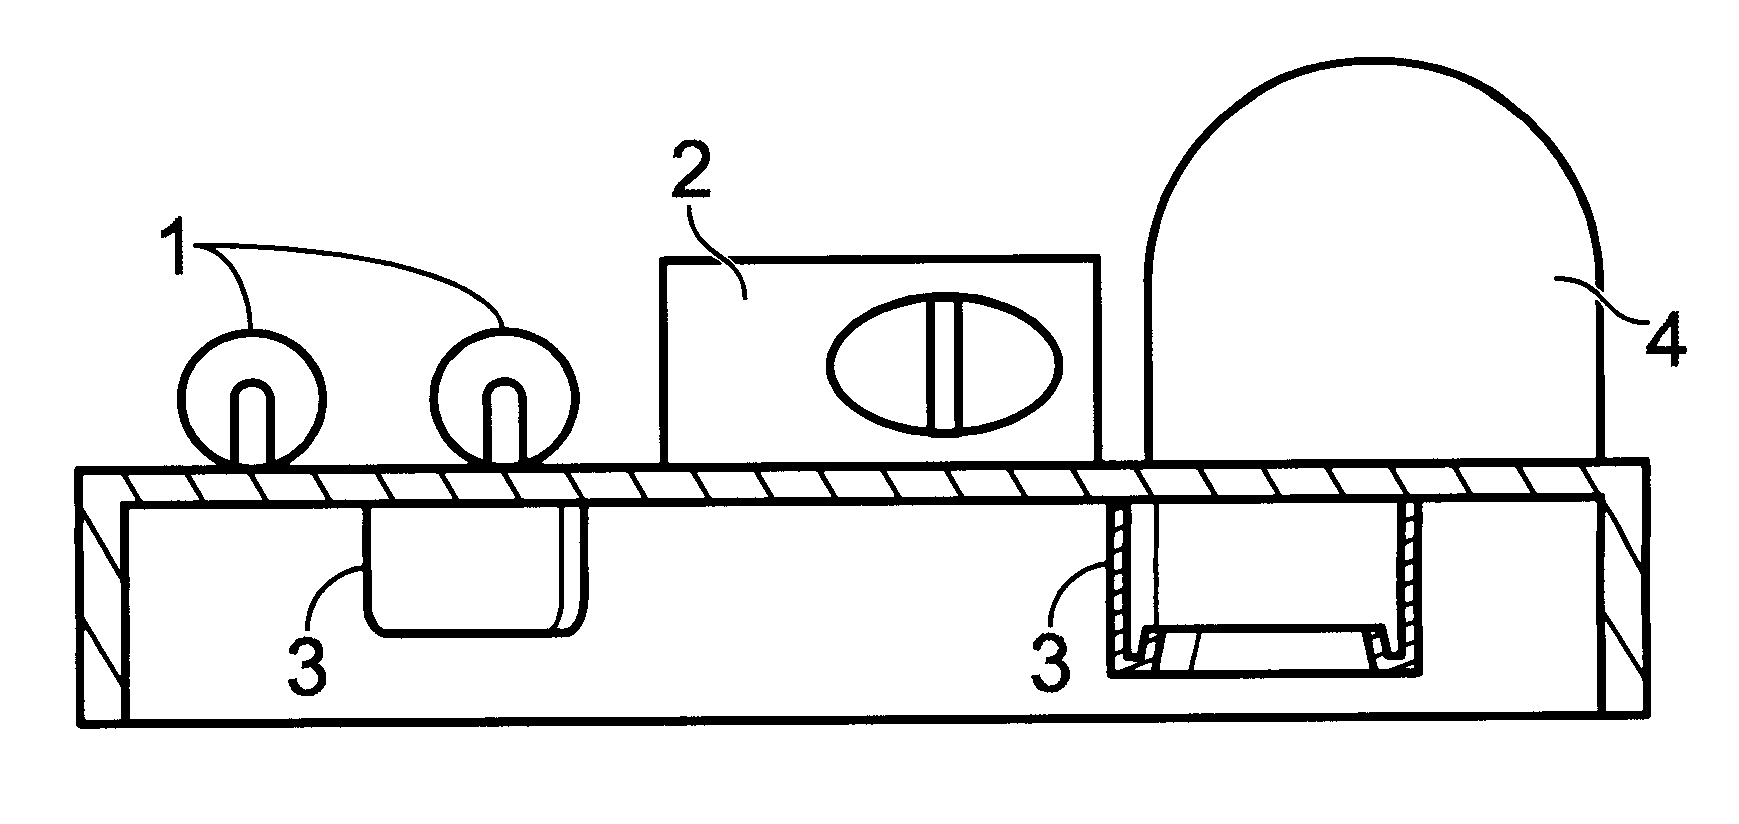 patent us6511202 - light emitting diode 9-volt battery snap flashlight